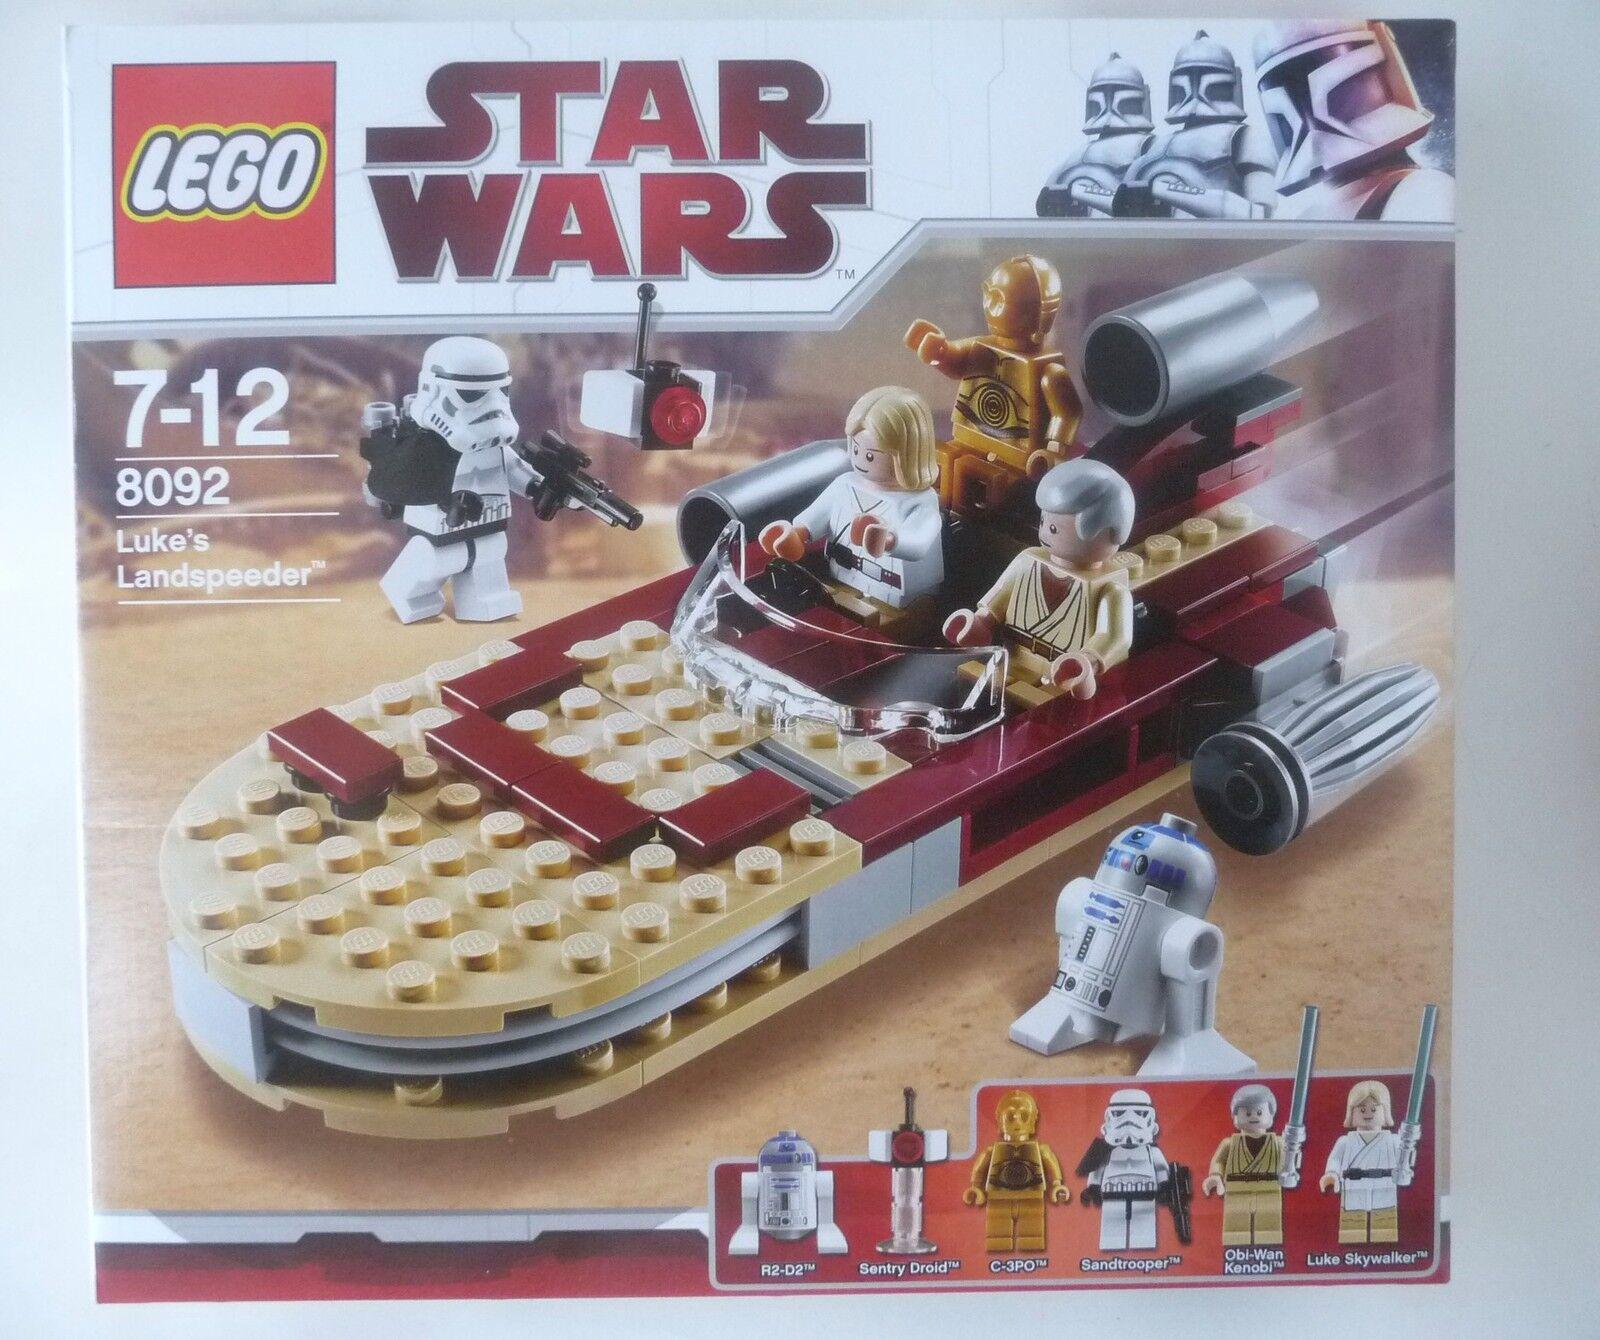 Lego Star Wars 8092 Luke's Landspeeder BNIB inc R2-D2 C-3PO Obi-Wan Kenobi